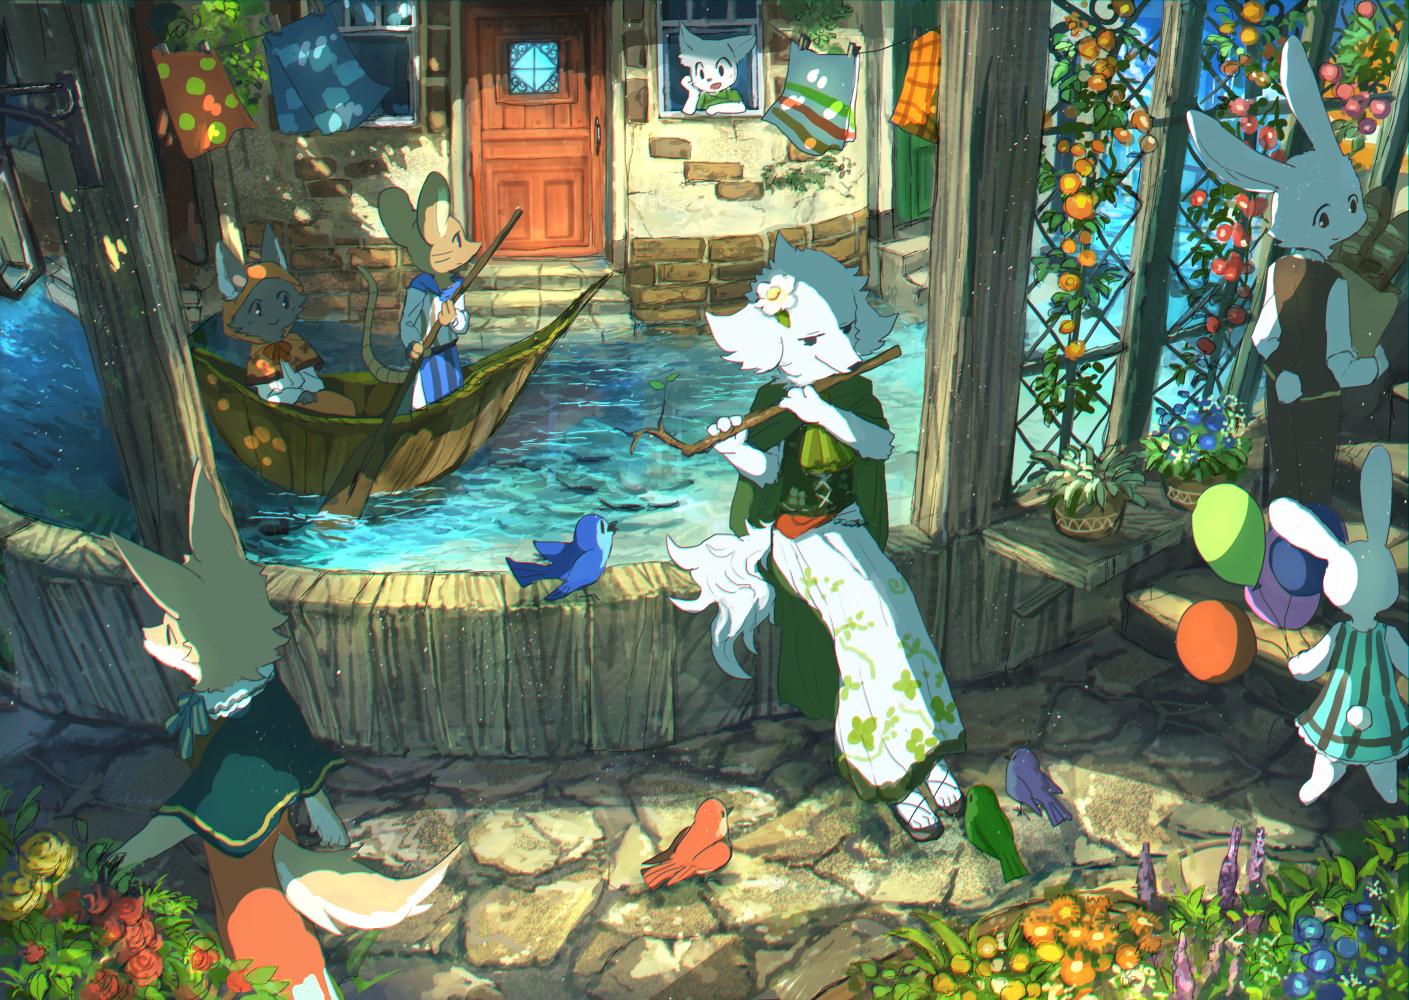 Anthro Rabbits Boat Dog Water Oar Roses Flowers Balloon Dress Fox Lavender Flowerpot Bricks Cobblest 1409x1000